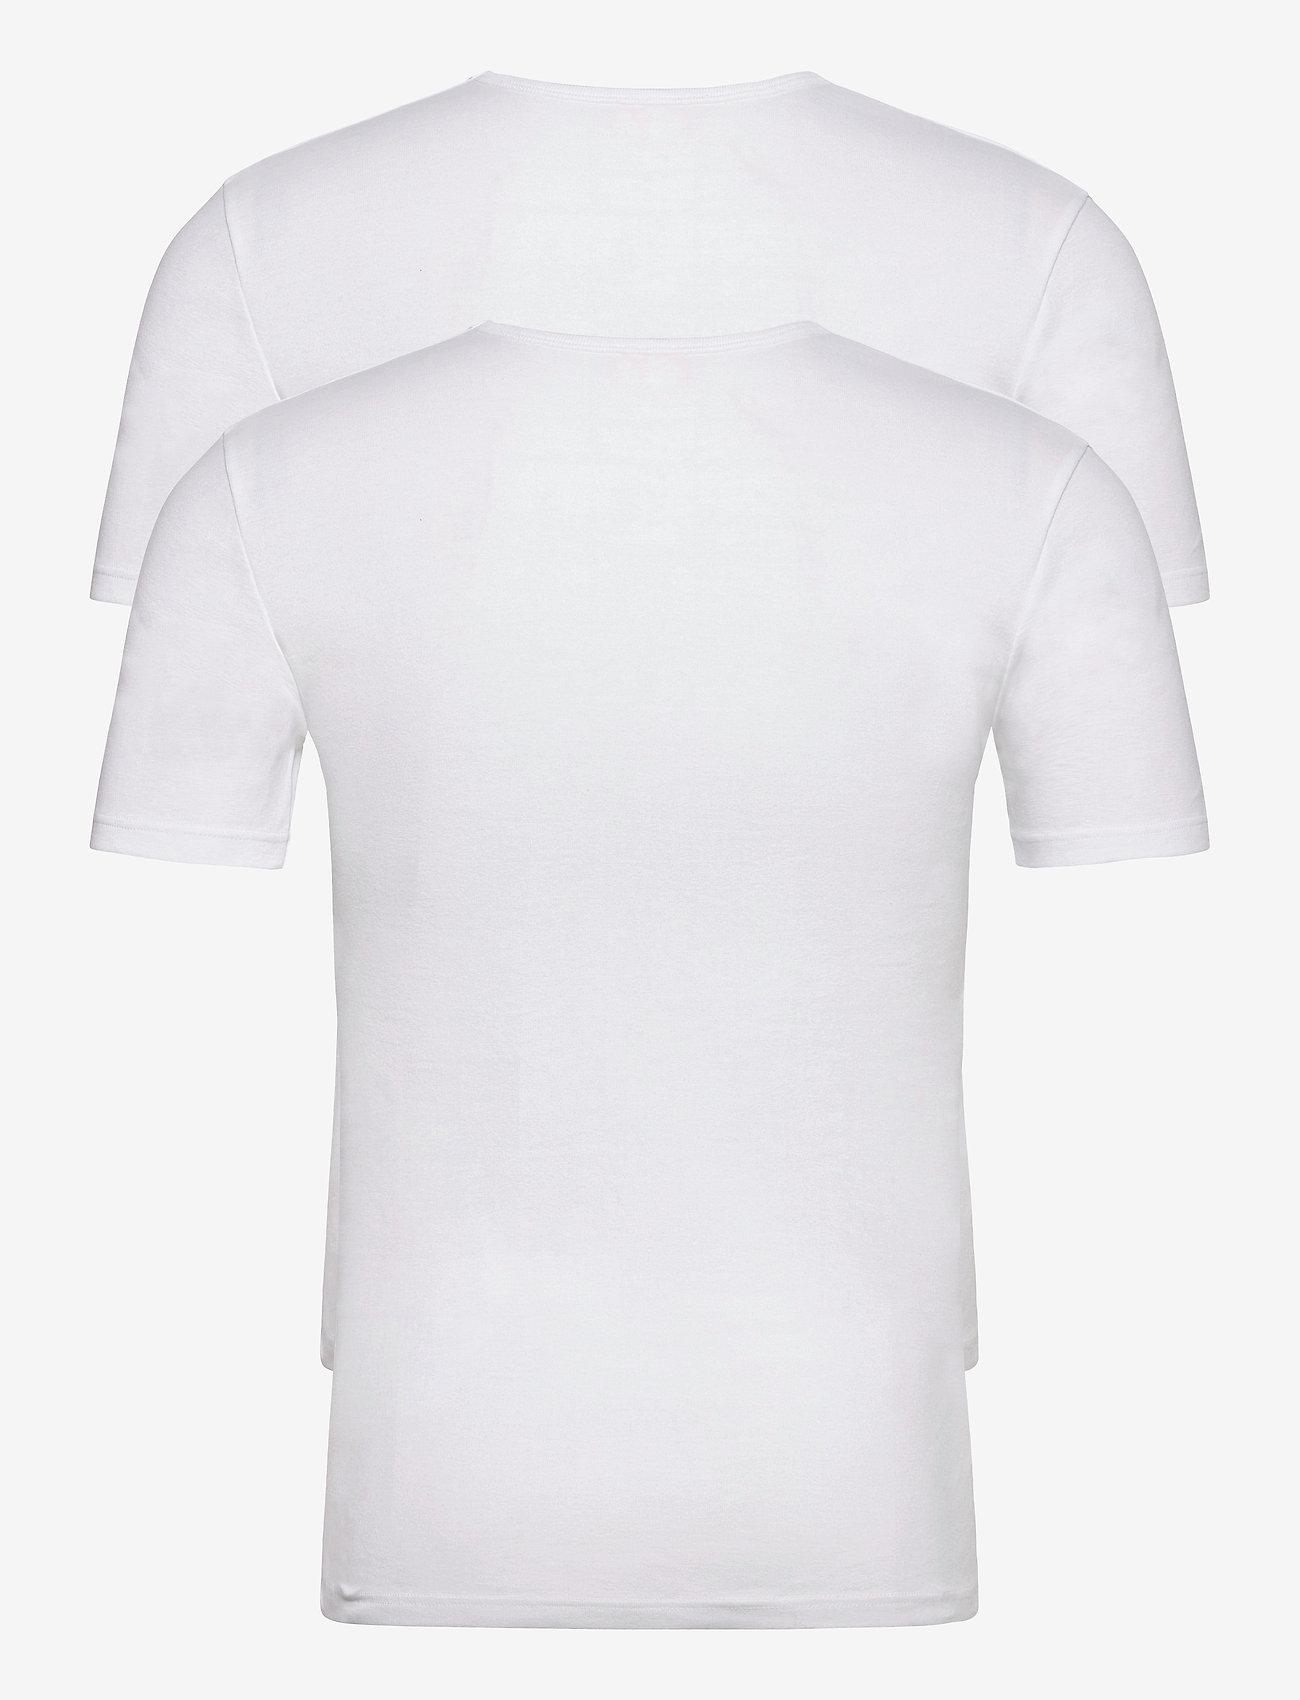 Armor Lux - 2 Pack T-Shirt - multipack - white/white - 1